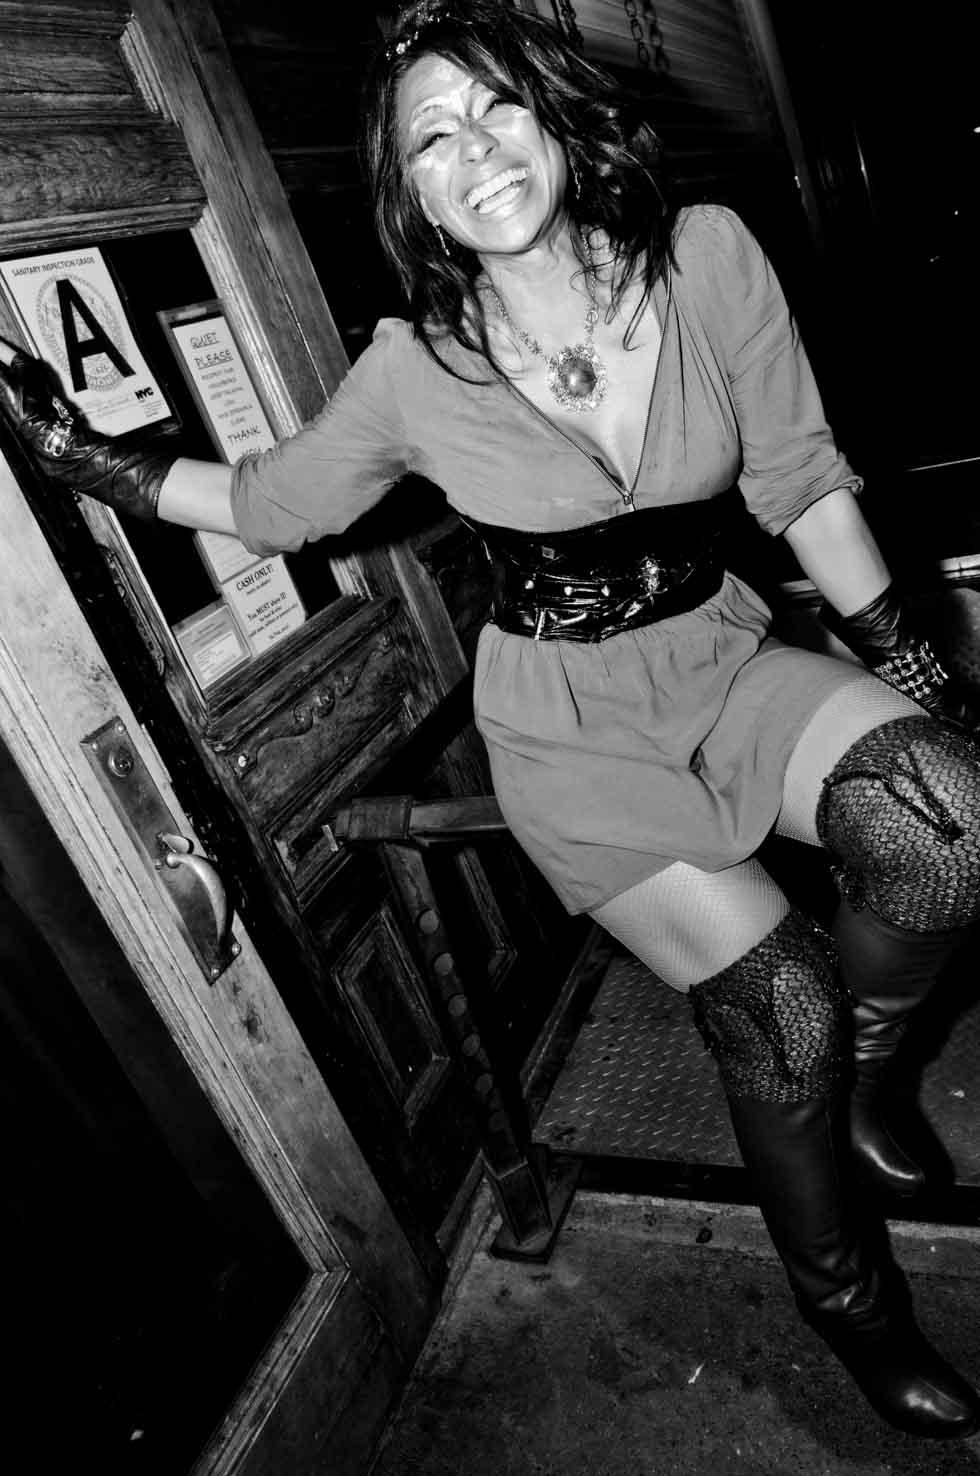 zum-schneider-nyc-2012-karneval-apocalyptika-4260.jpg